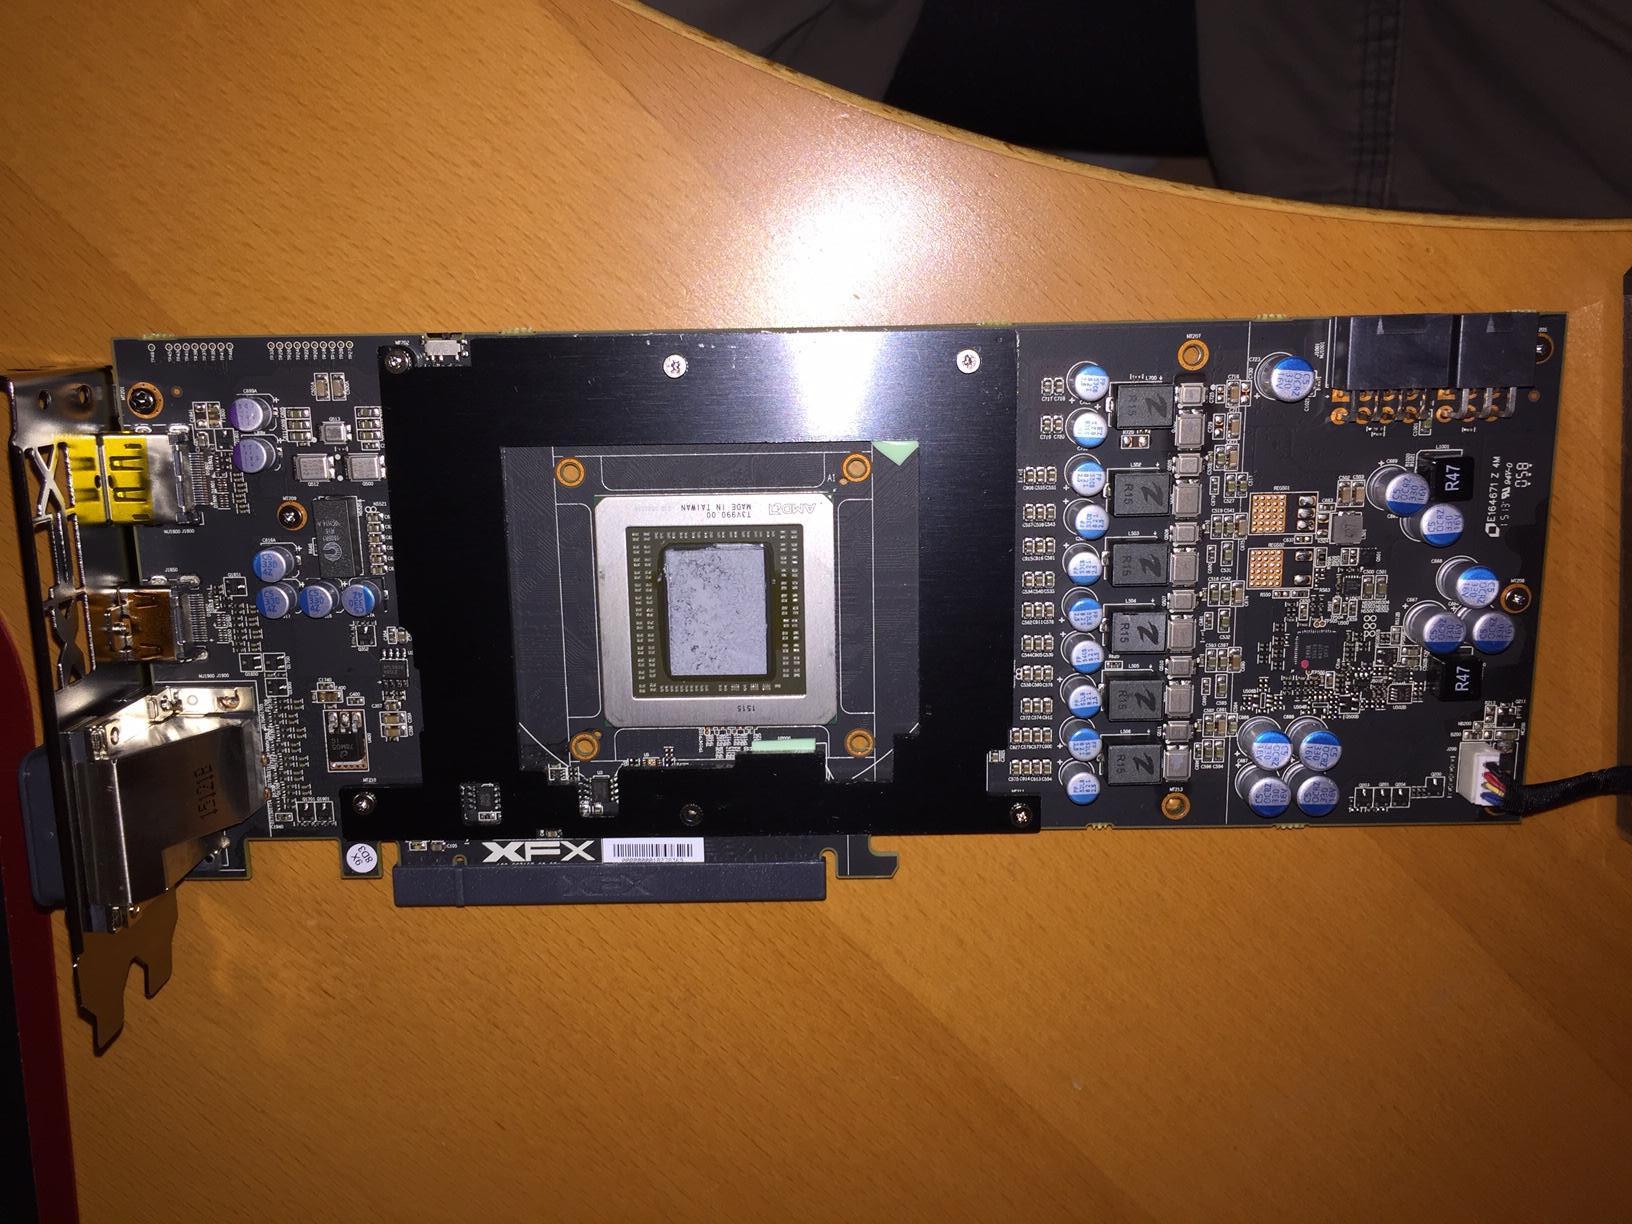 Radeon R9 390X Taken Apart, PCB Reveals a Complete Re-brand